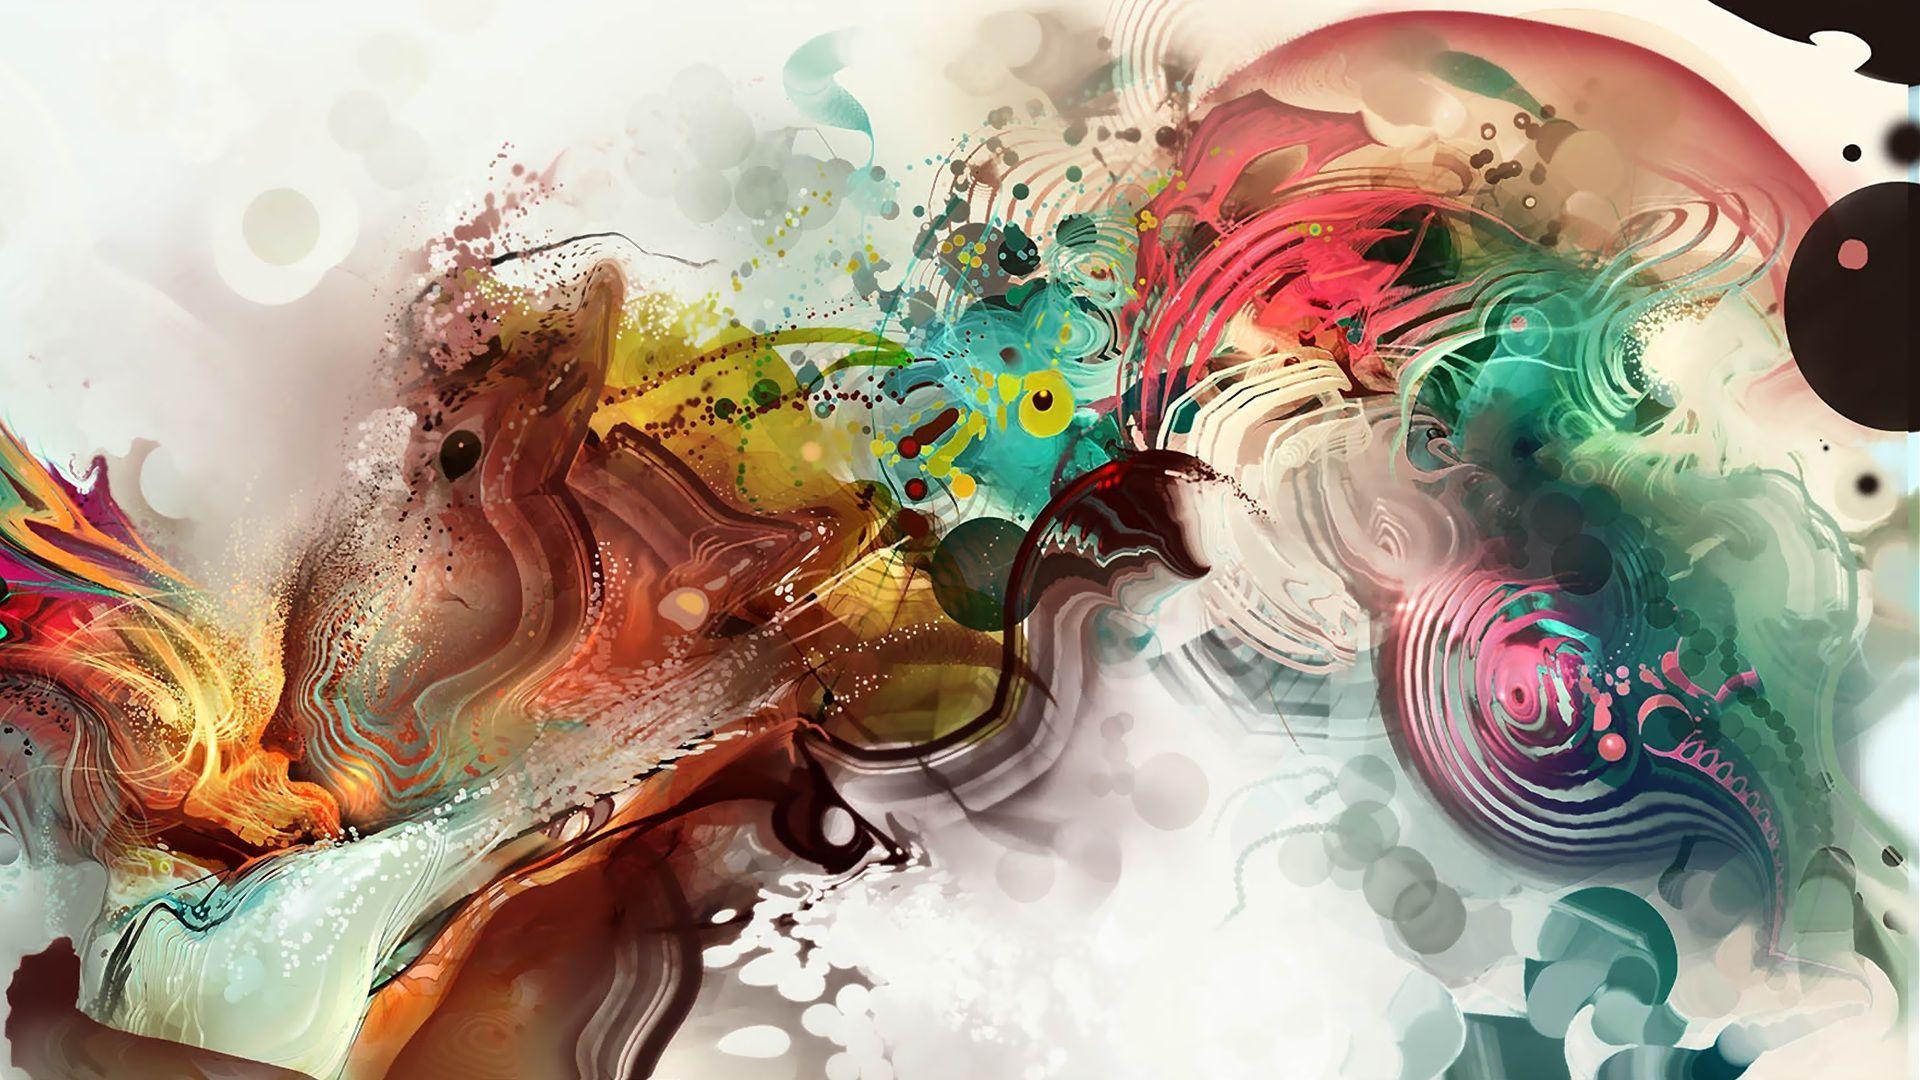 Digital Art Background picture wallpaper